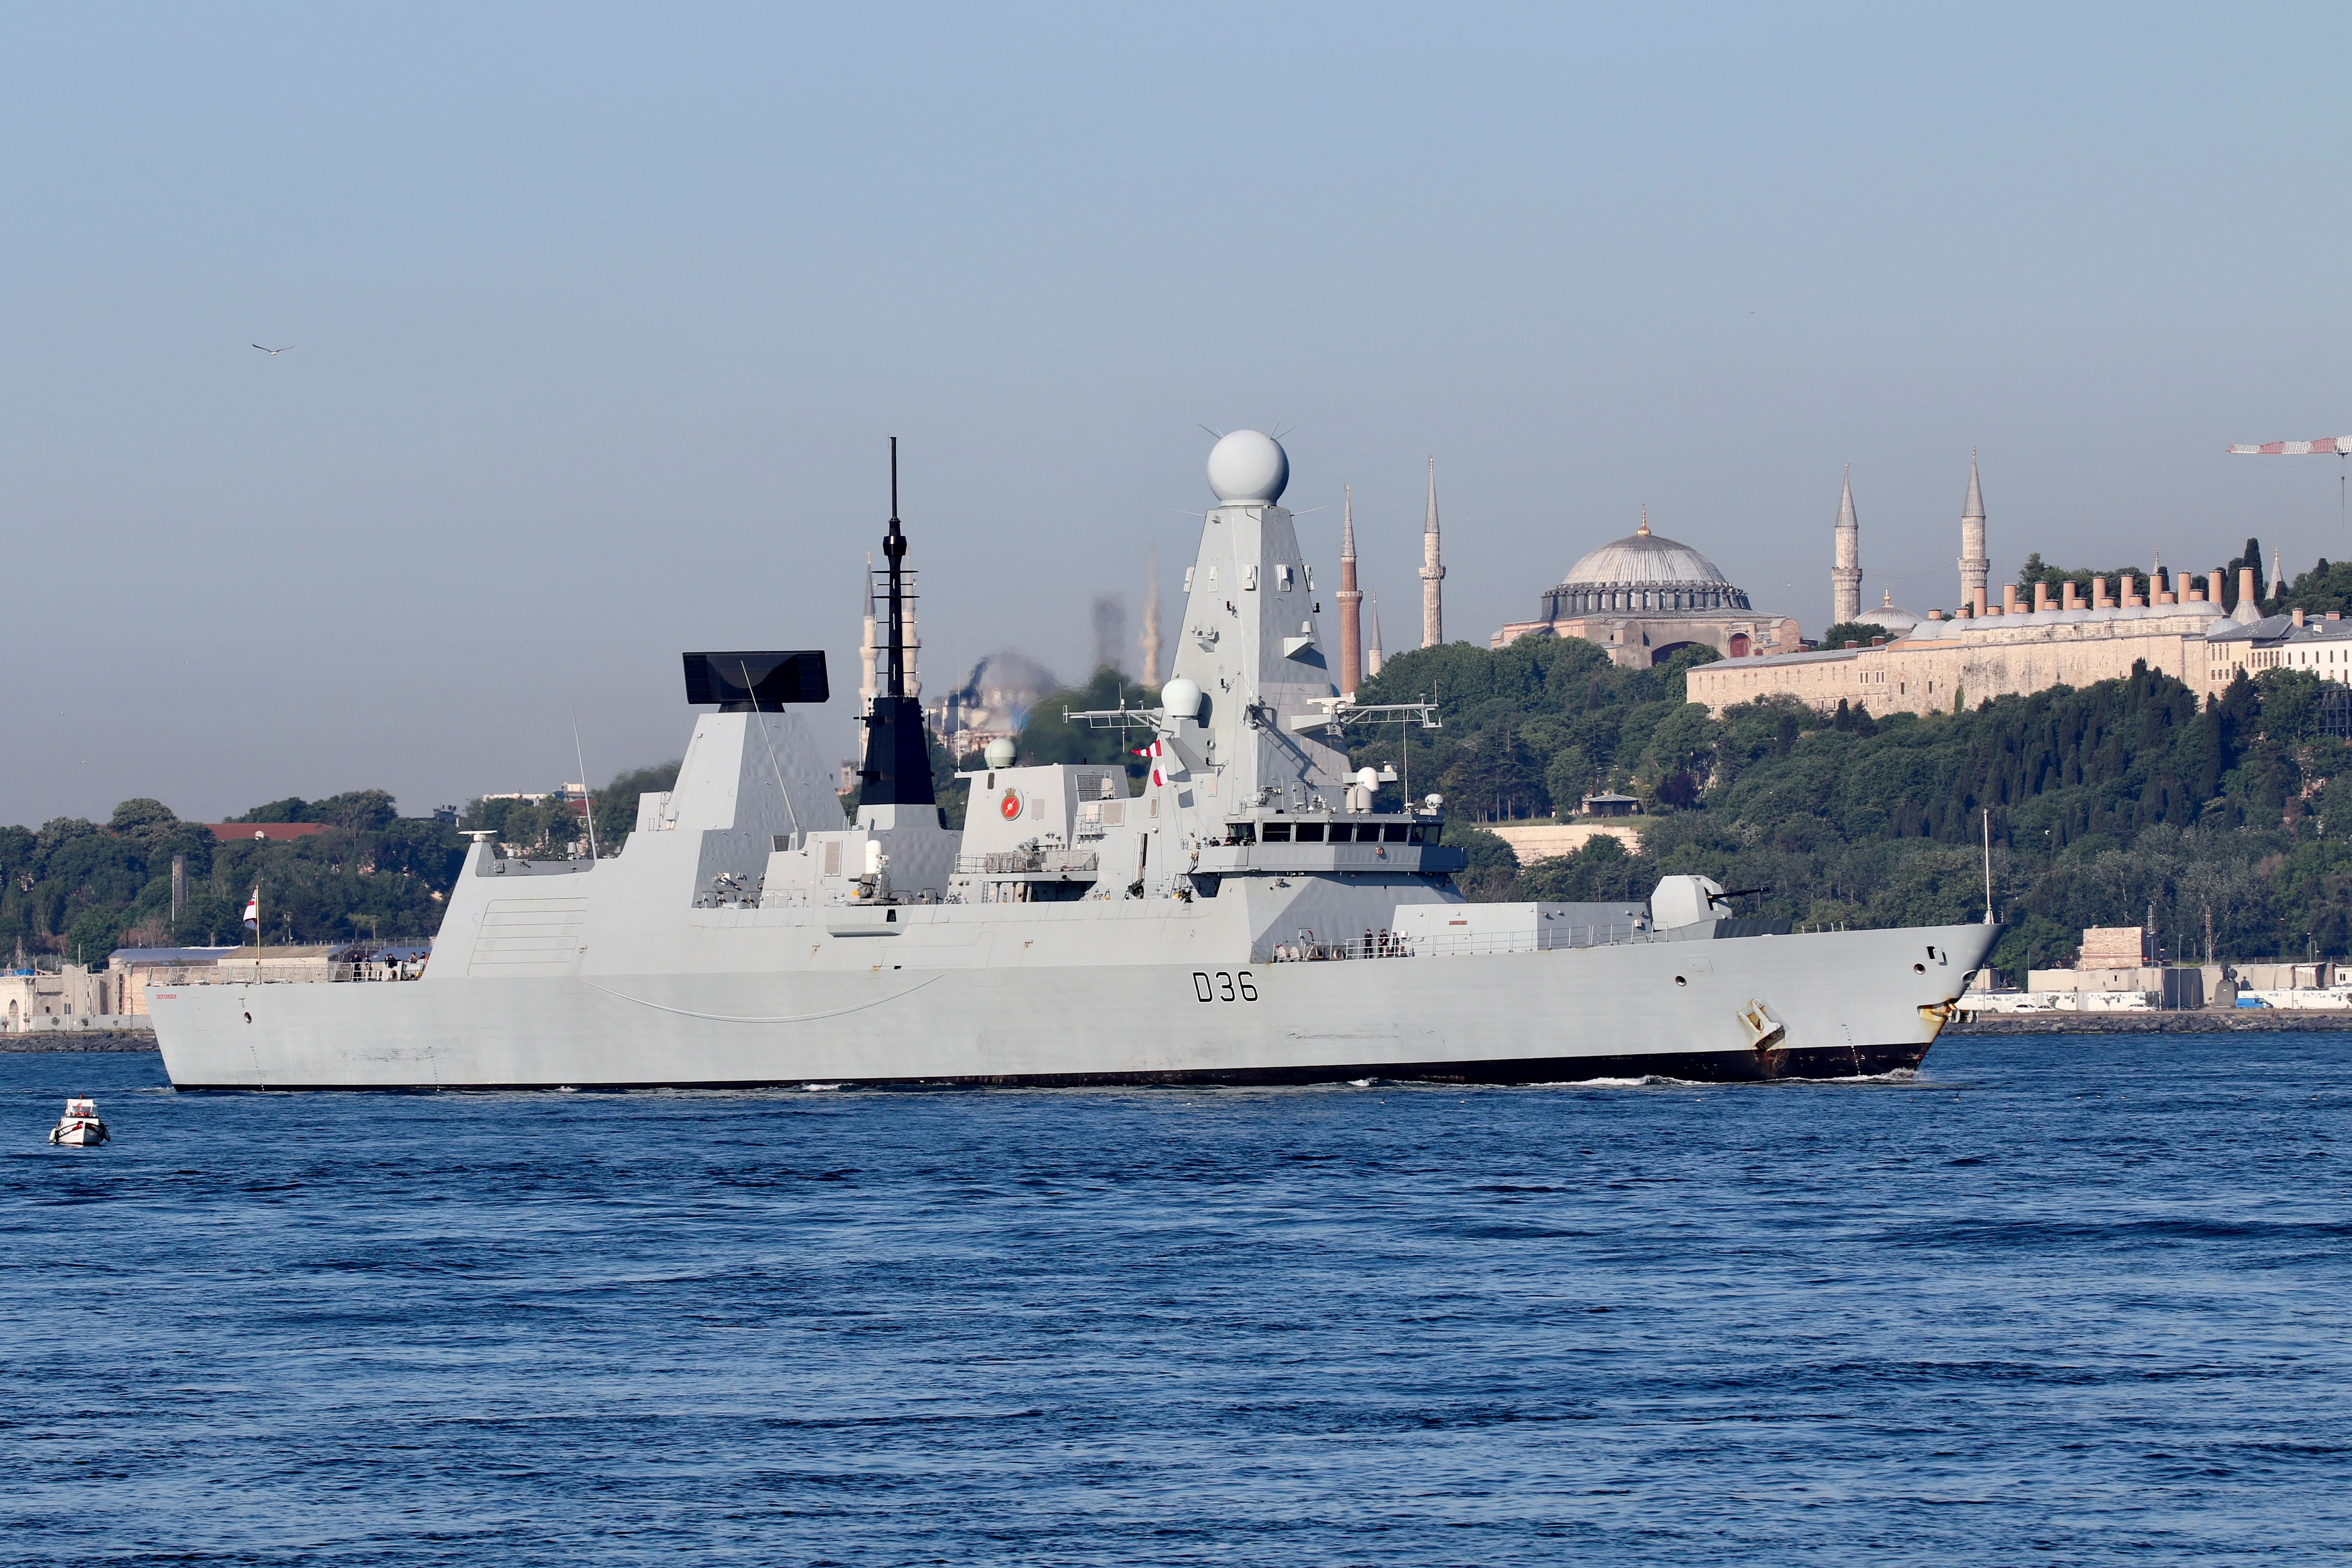 British Royal Navy's Type 45 destroyer HMS Defender arrives for a port visit in Istanbul, Turkey June 9, 2021. REUTERS/Yoruk Isik/File Photo